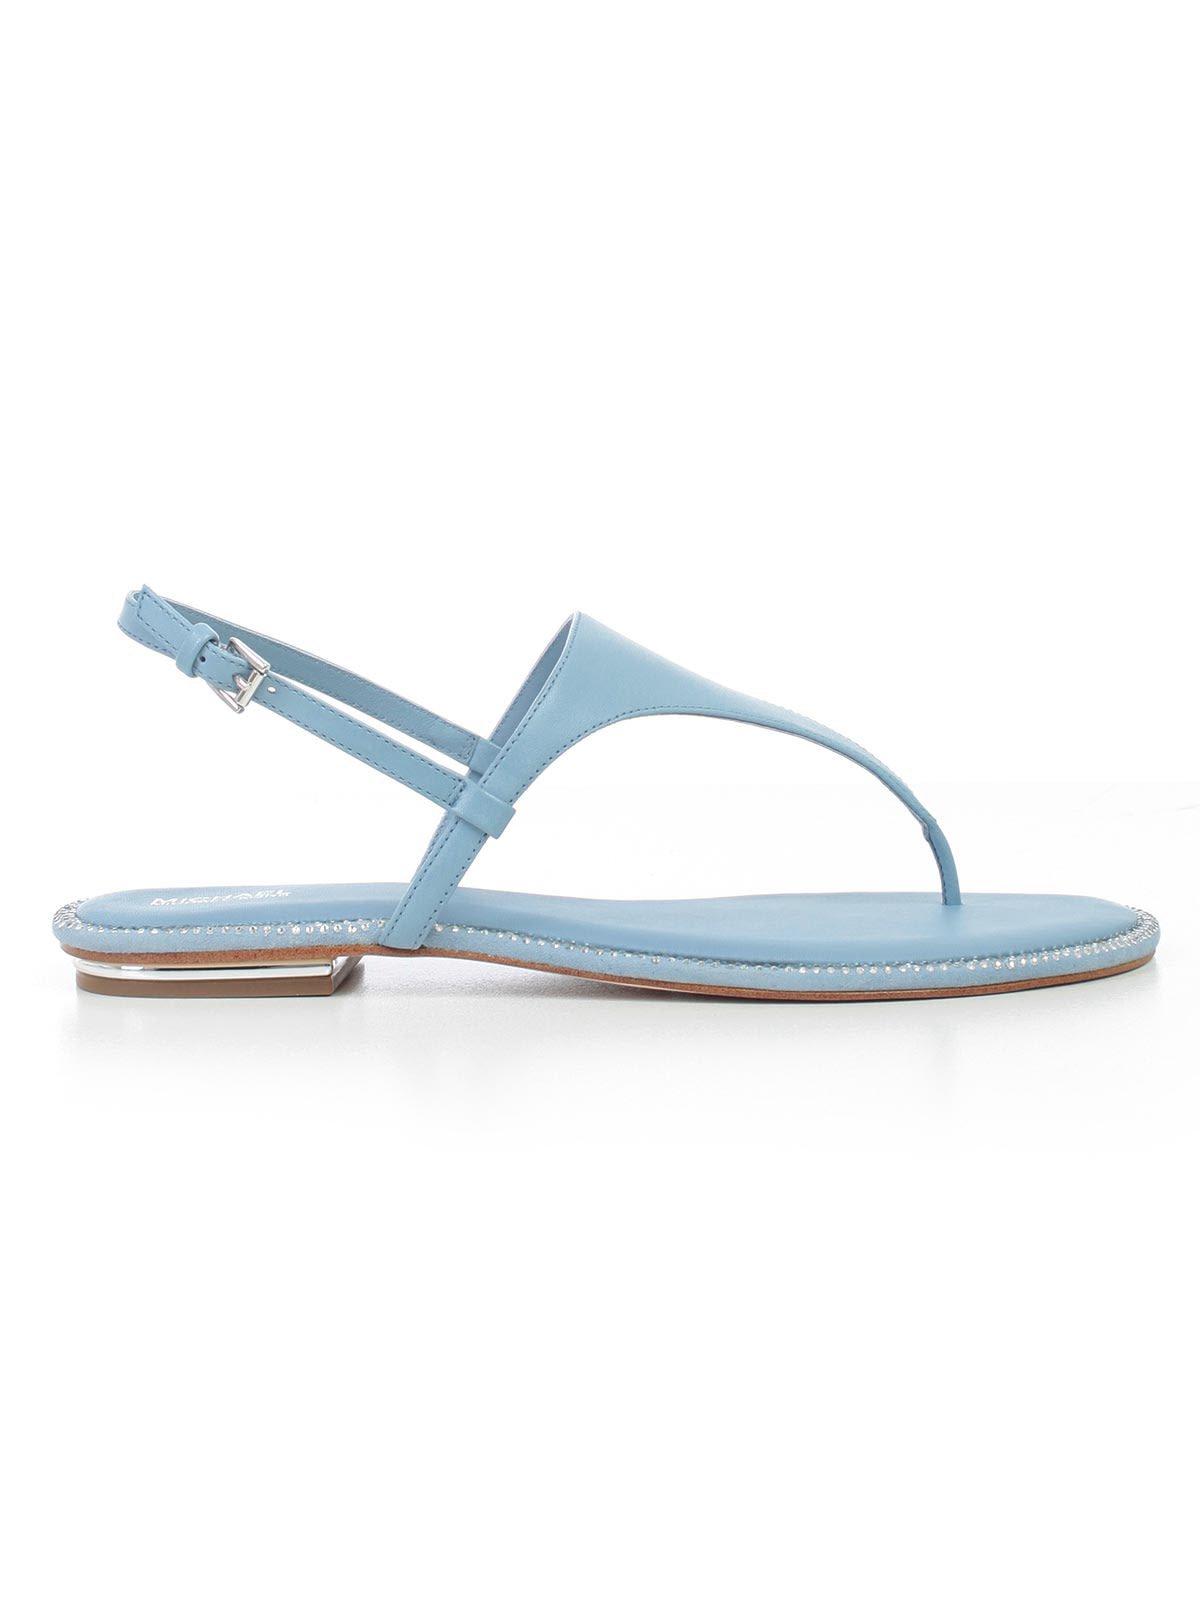 Michael Michael Kors Thin Strap Sandals